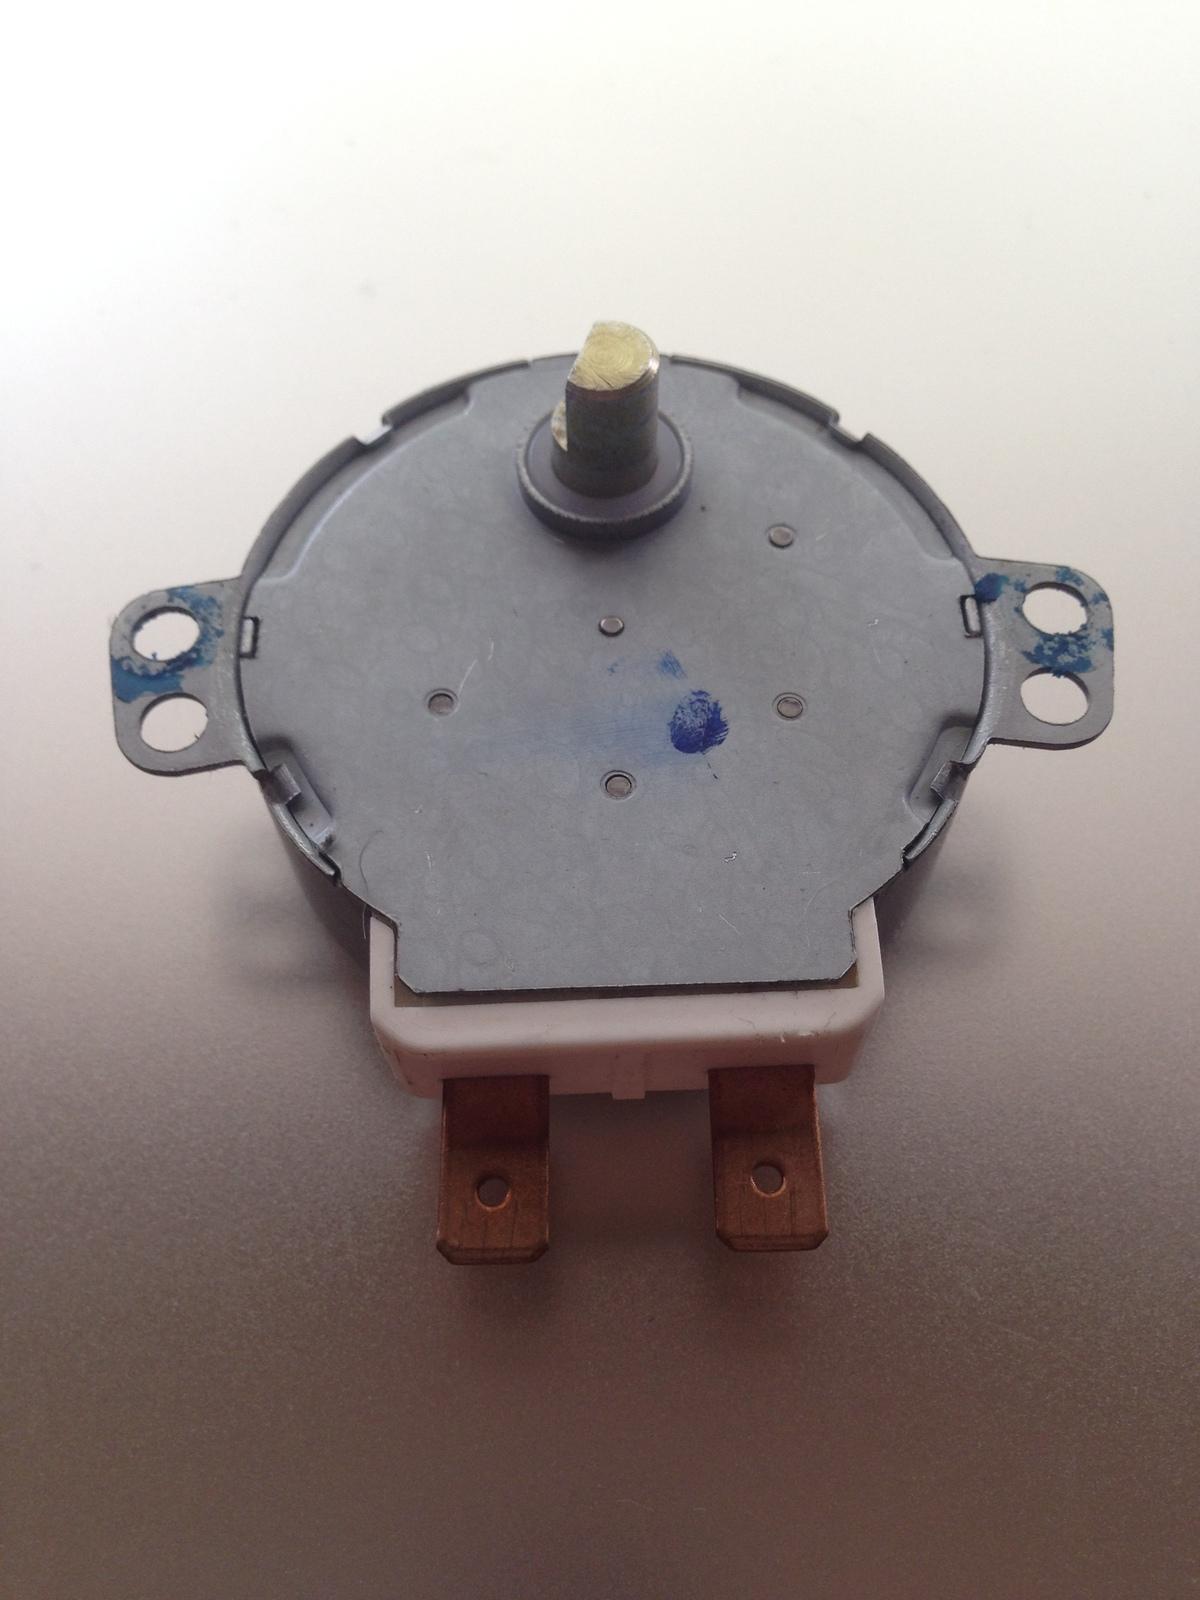 General electric microwave oem gm1612f47 turntable motor for General electric motor parts